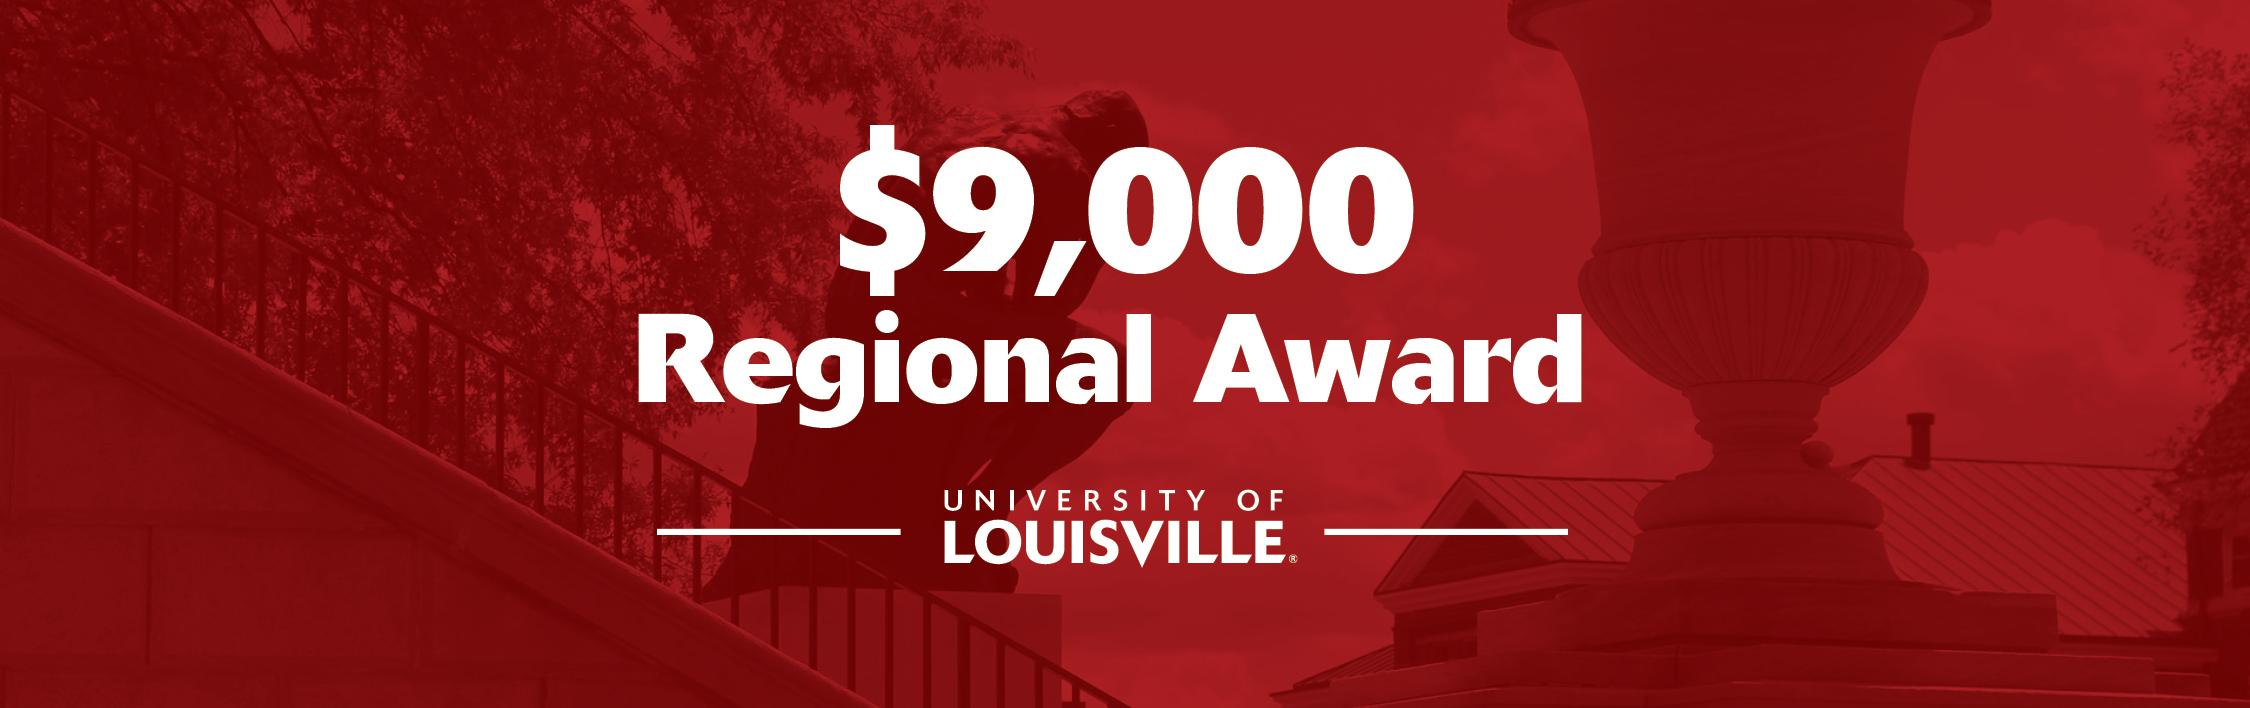 $9,000 Regional Award